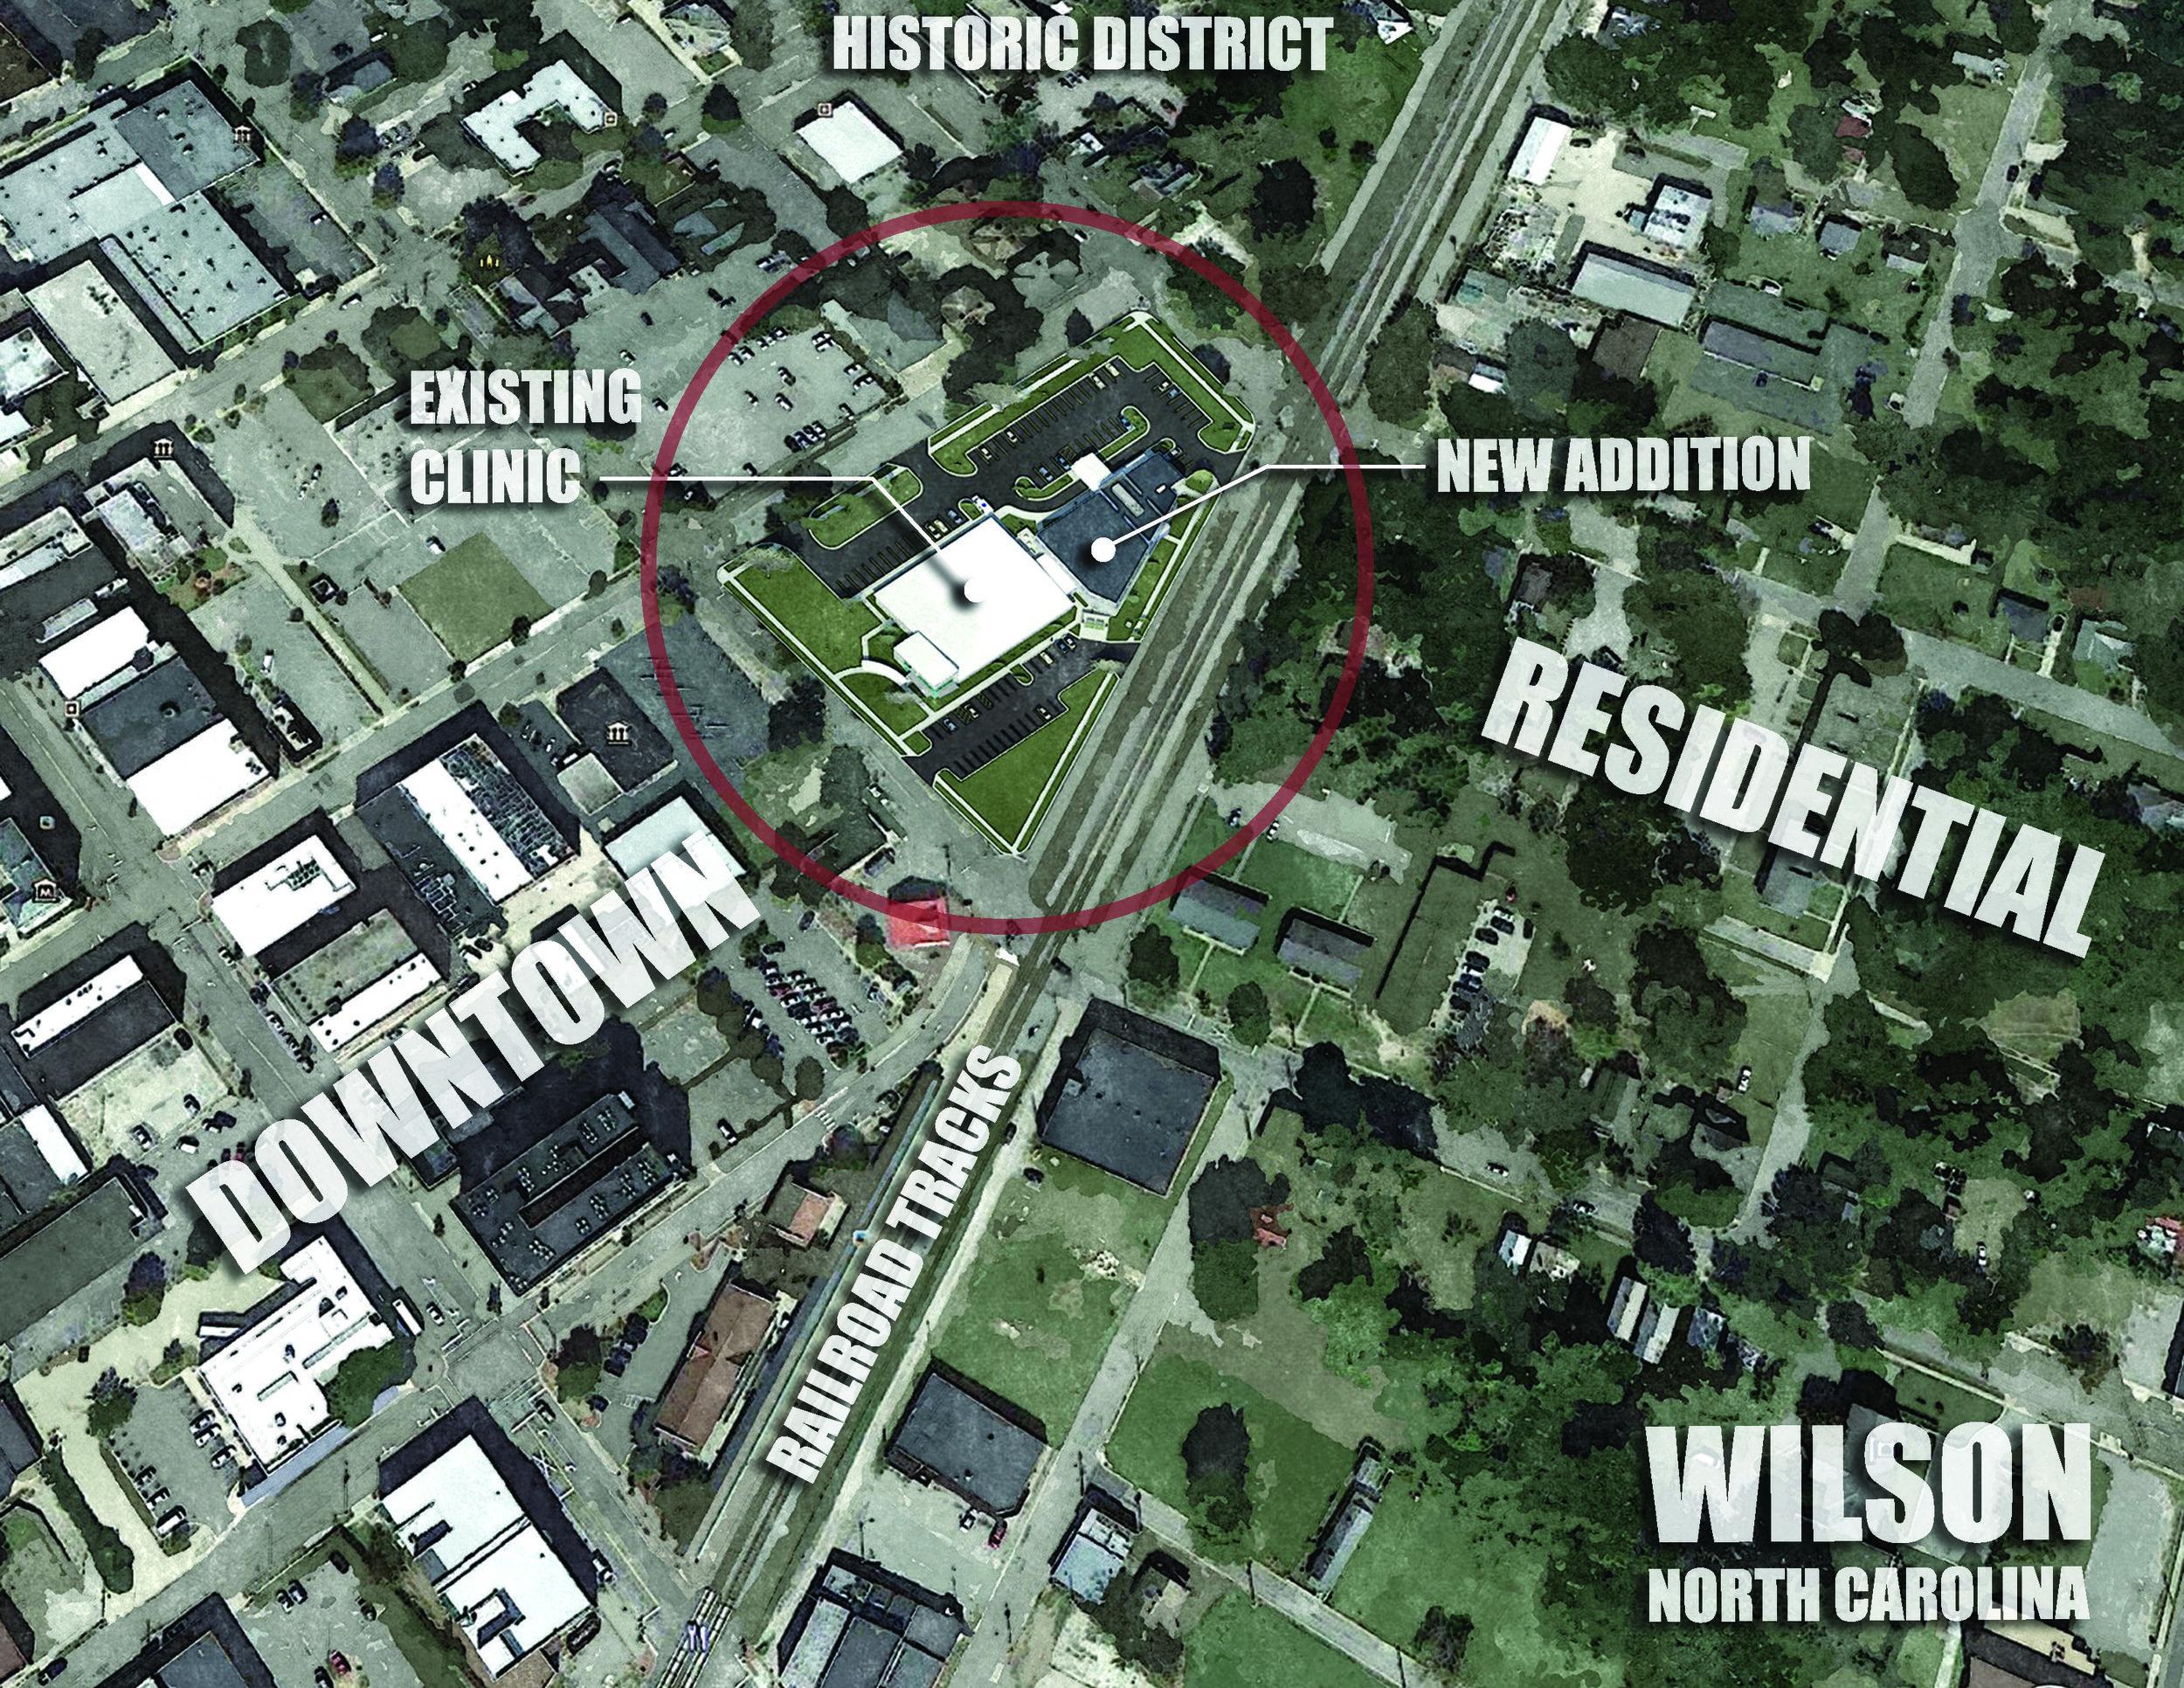 Wilson Community Health Center